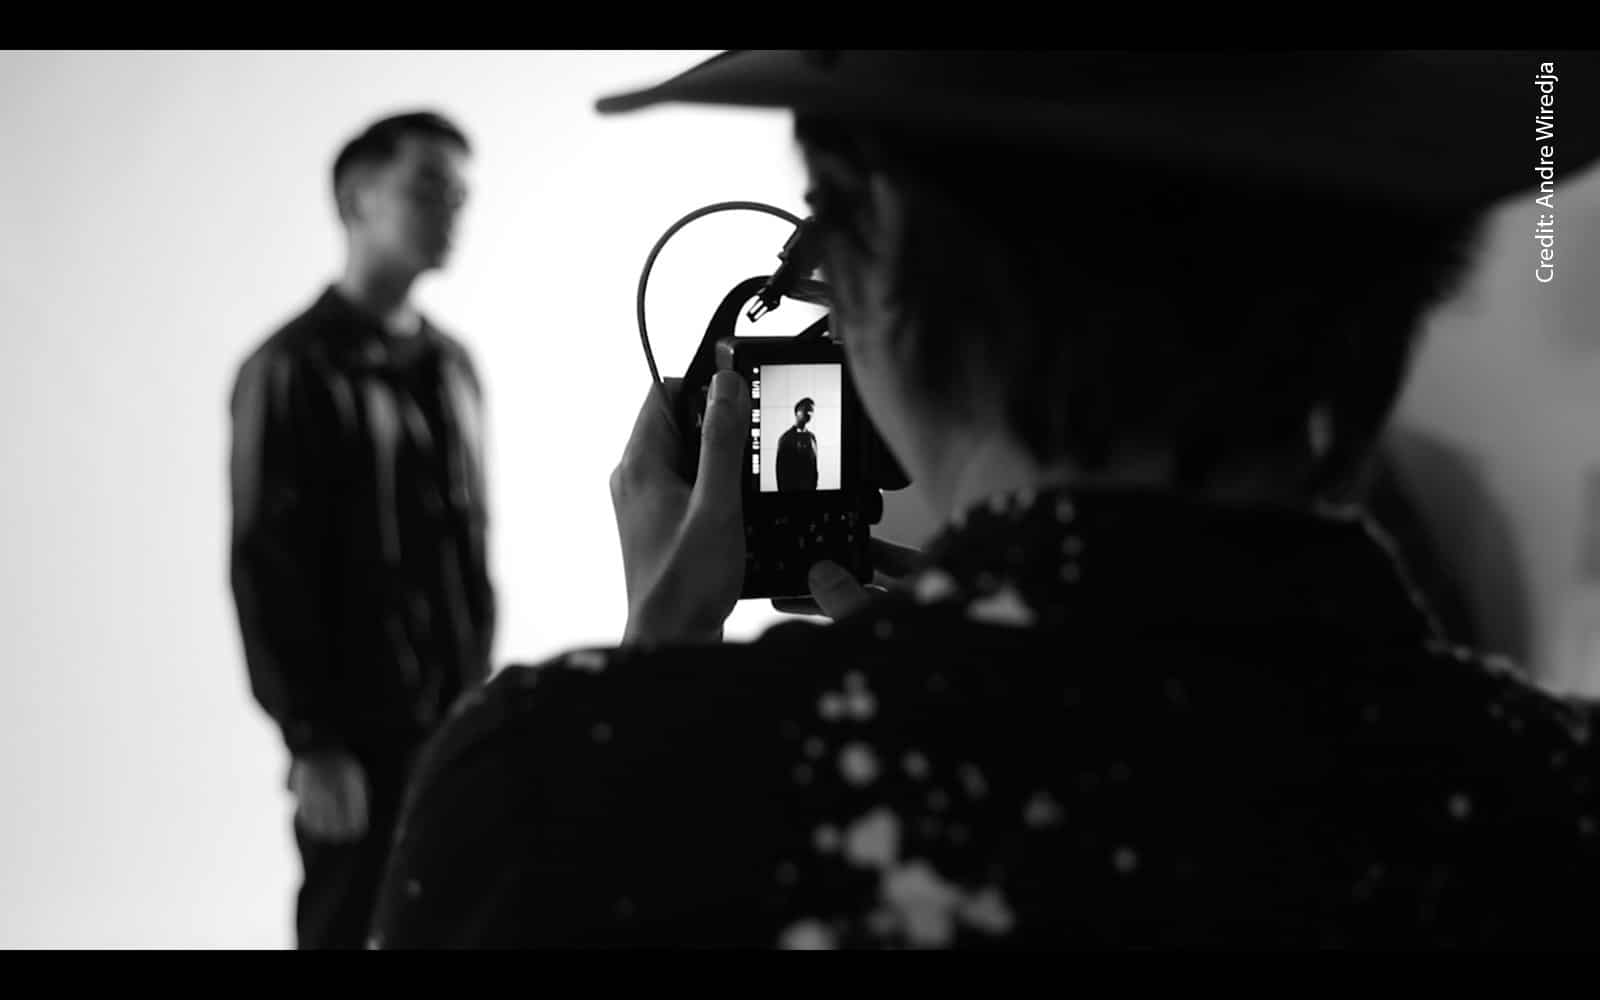 fotografer Andre Wiredja bukan virtual photoshoot